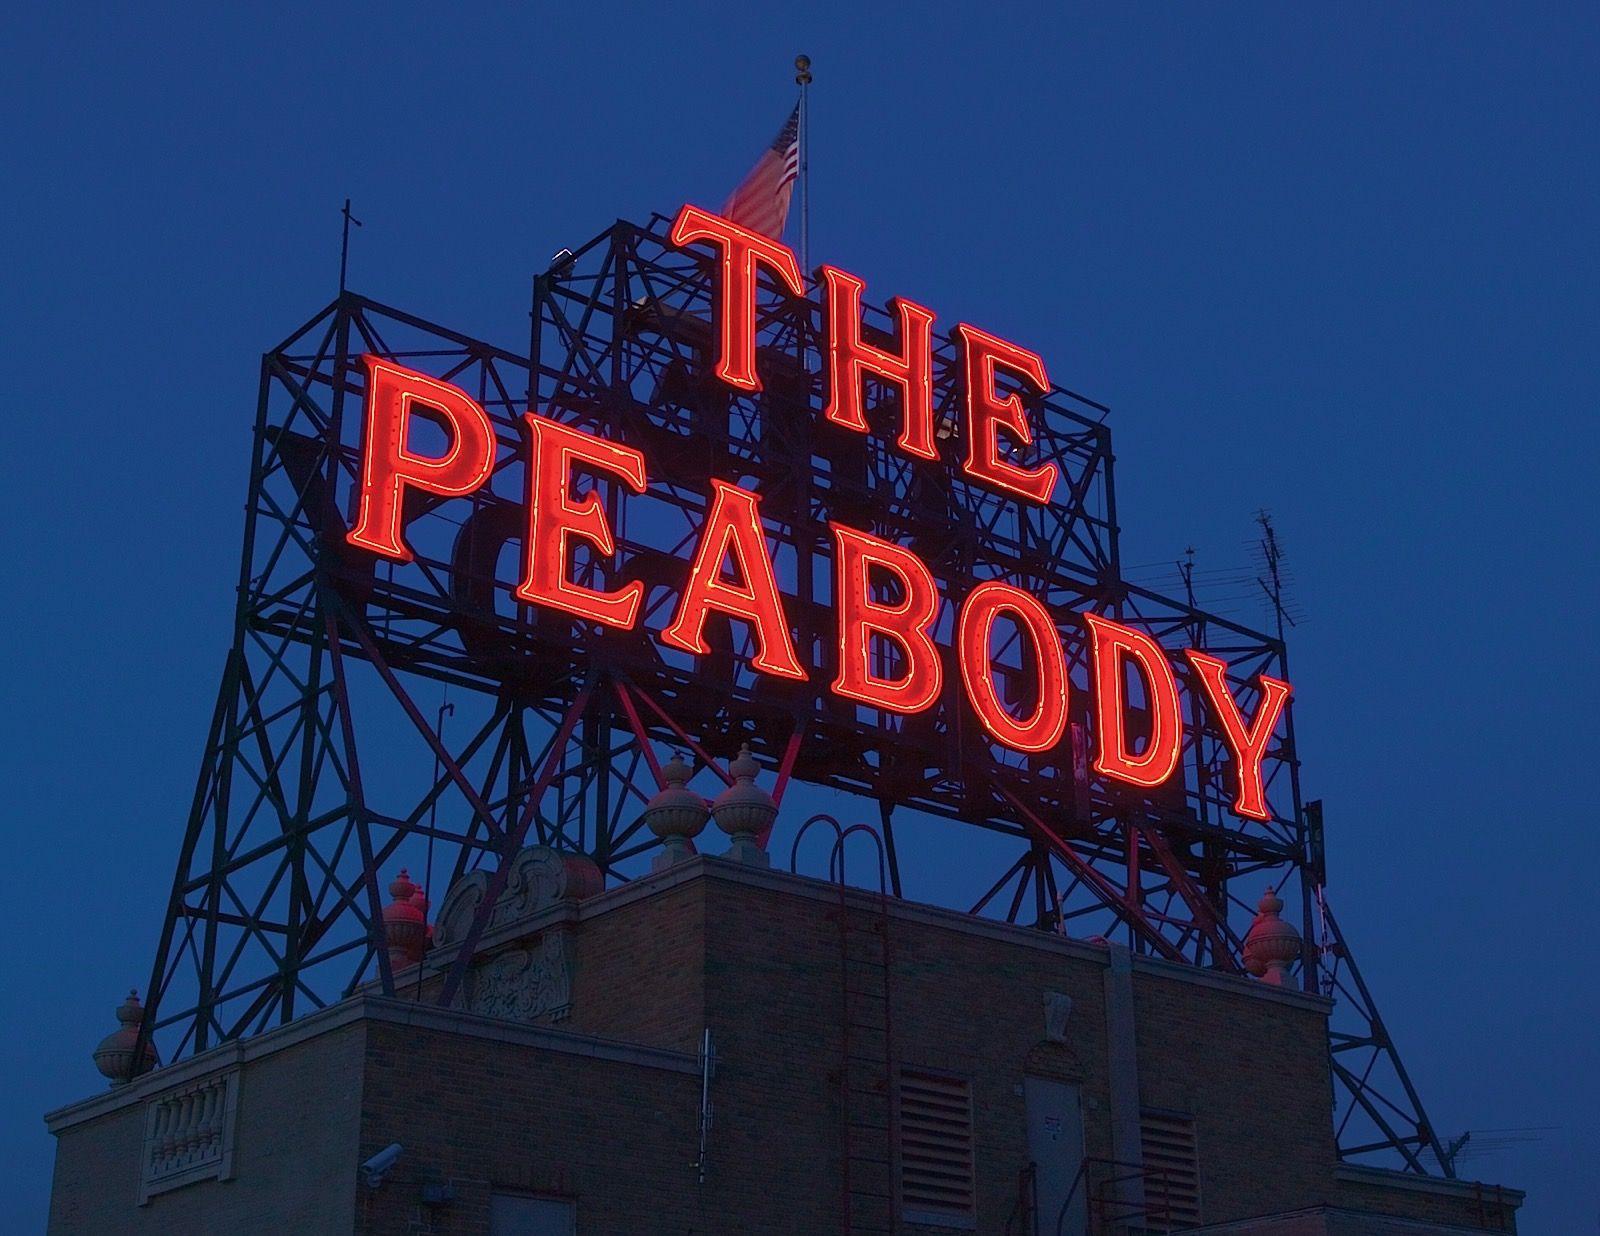 The Peabody Memphis Exterior Sign